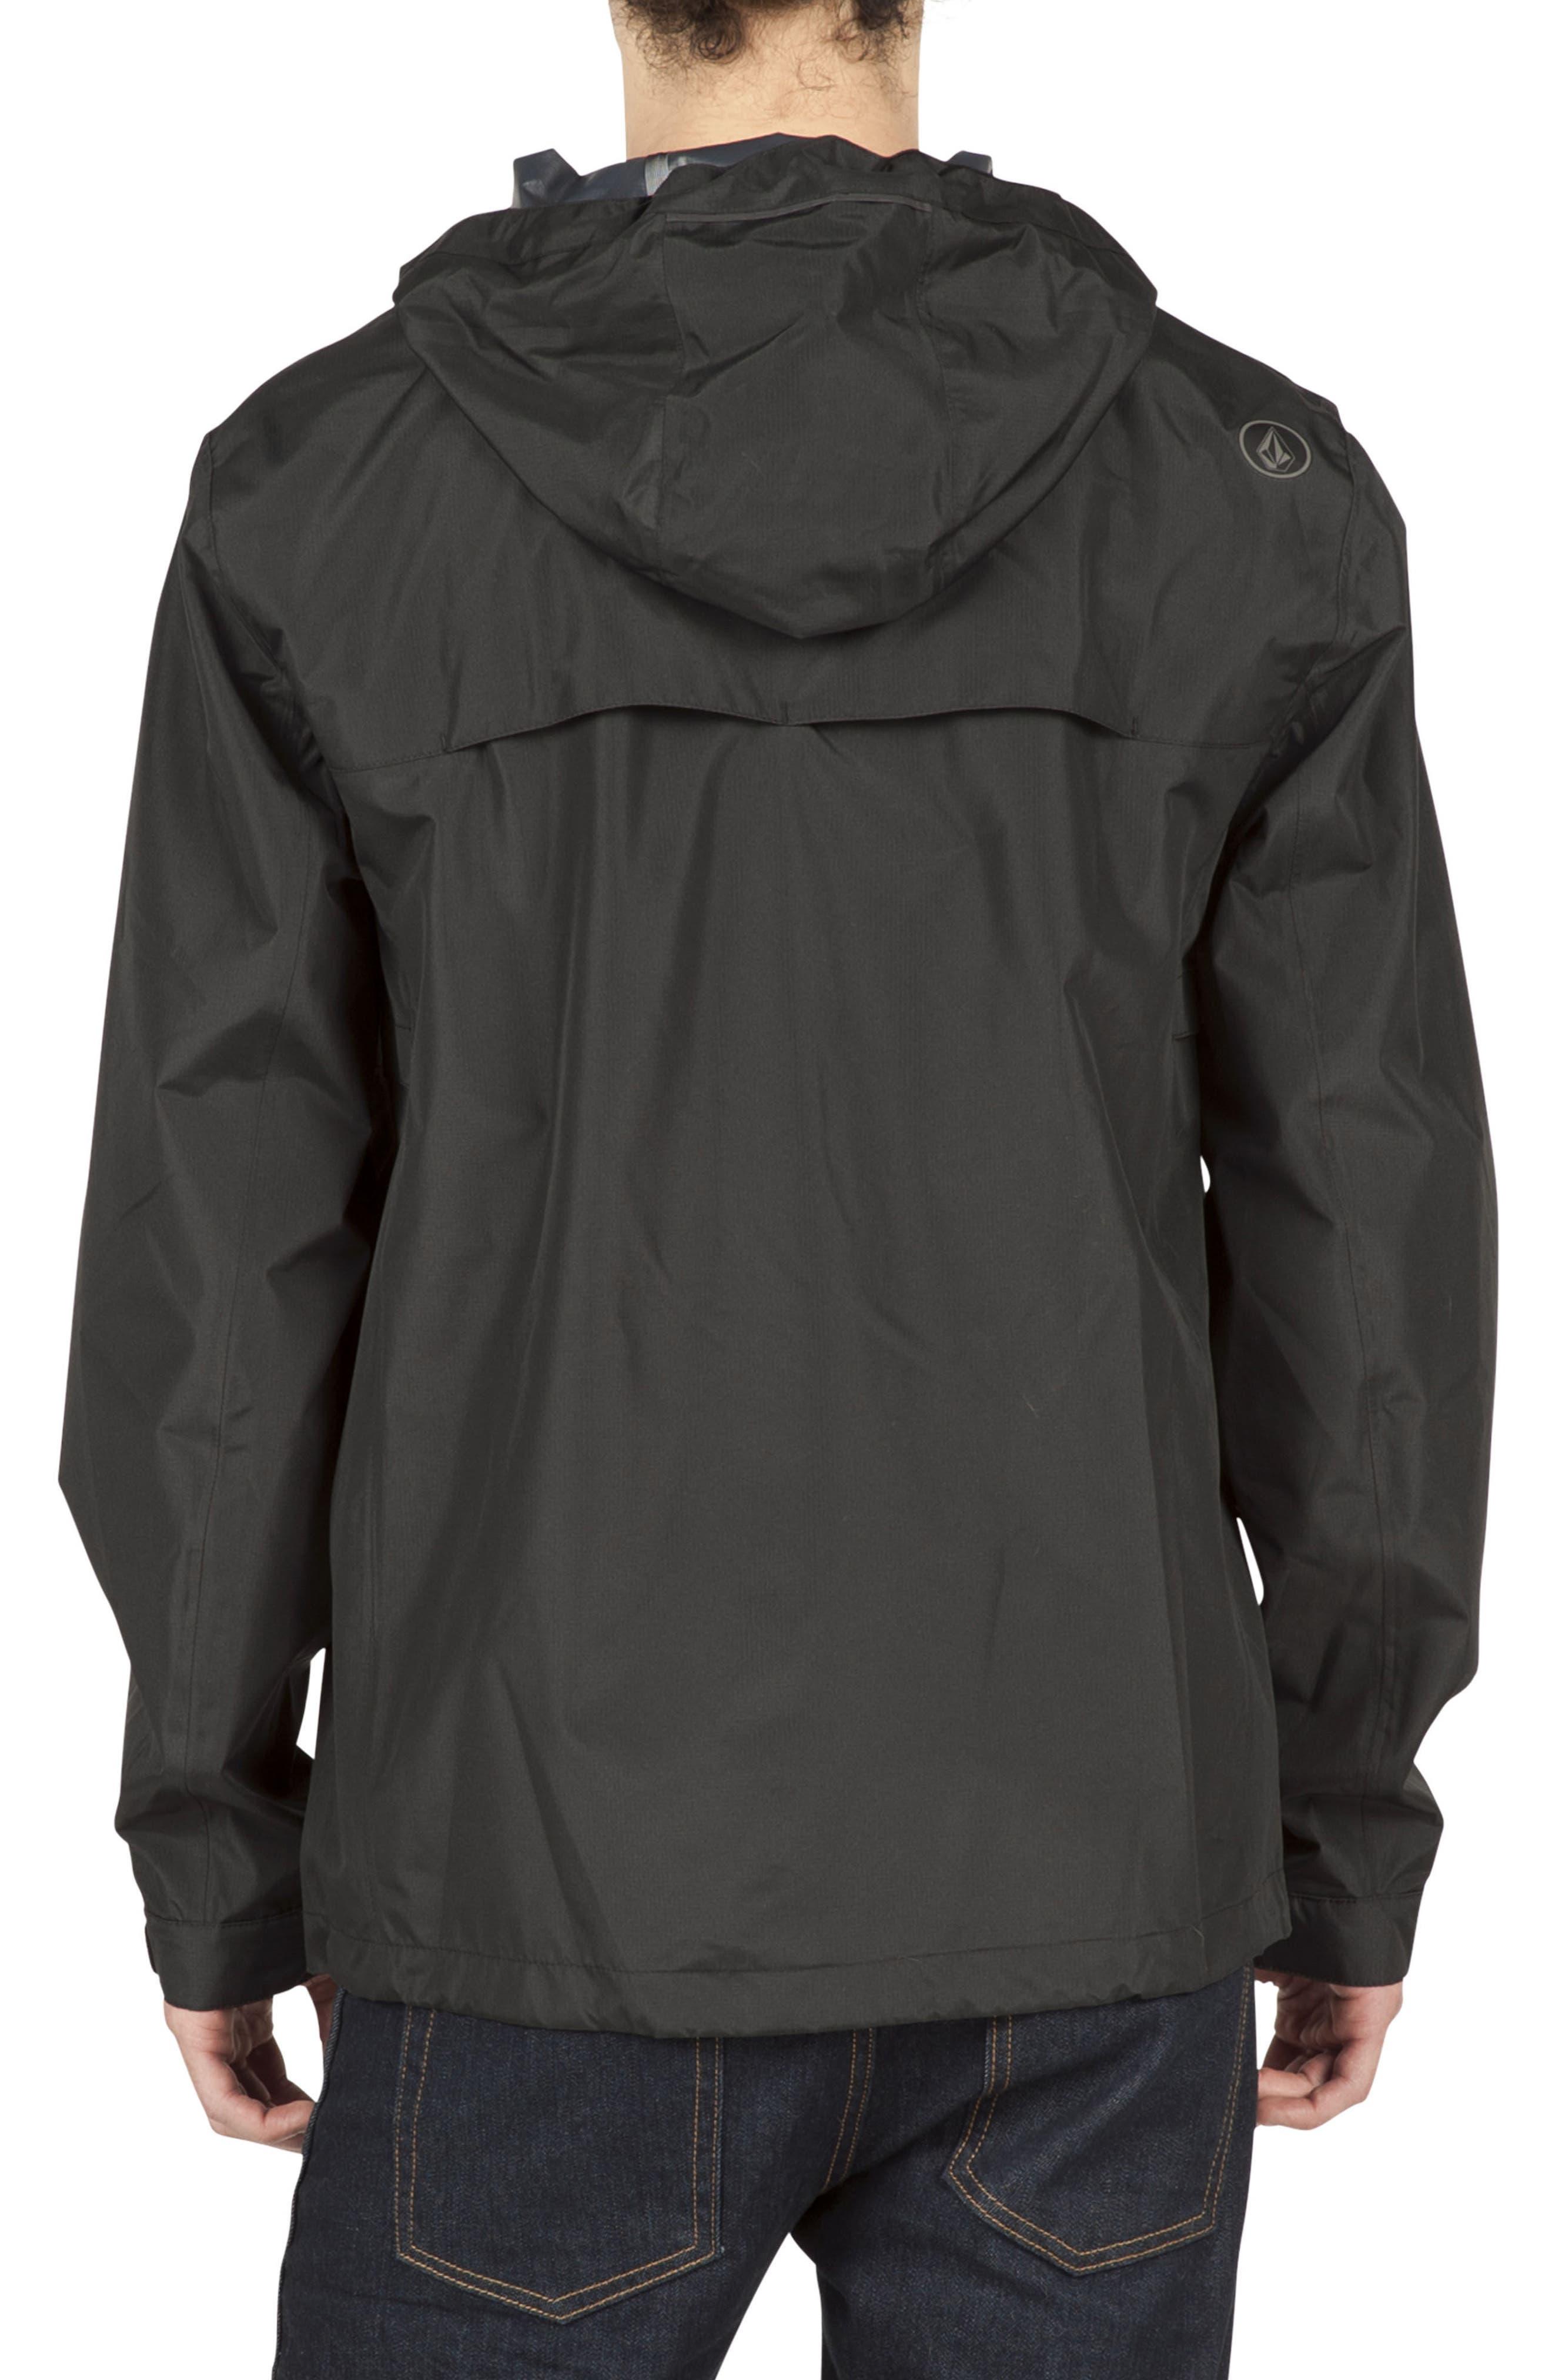 Water Resistant Zip Jacket,                             Alternate thumbnail 2, color,                             001